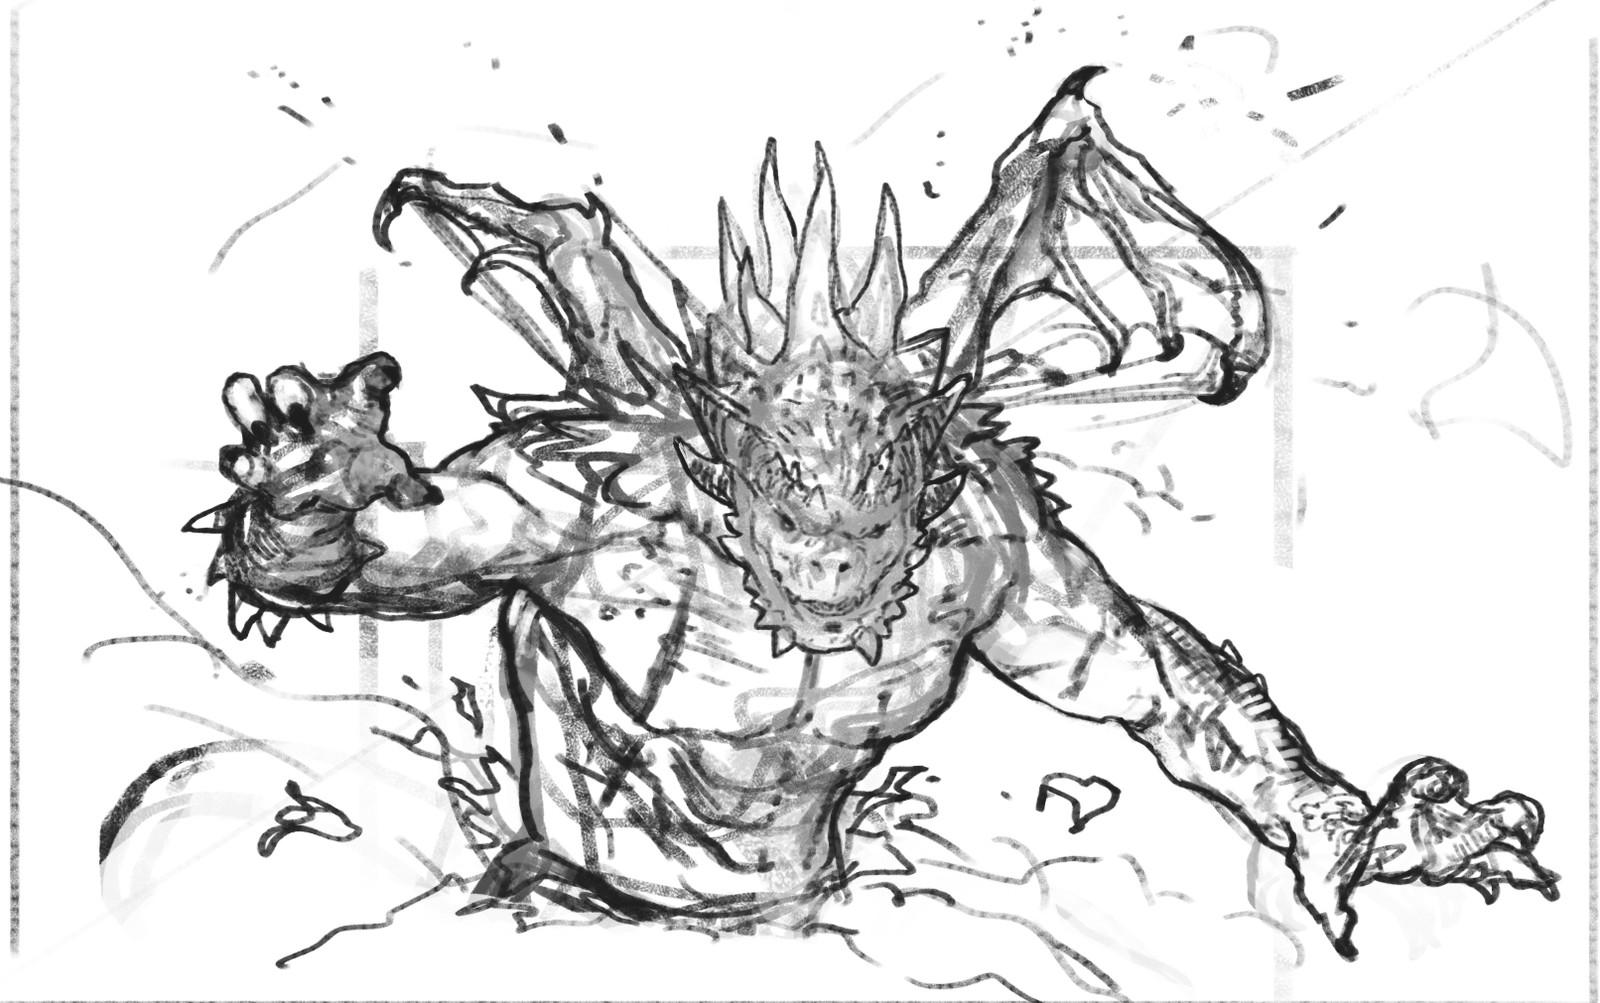 Base sketch